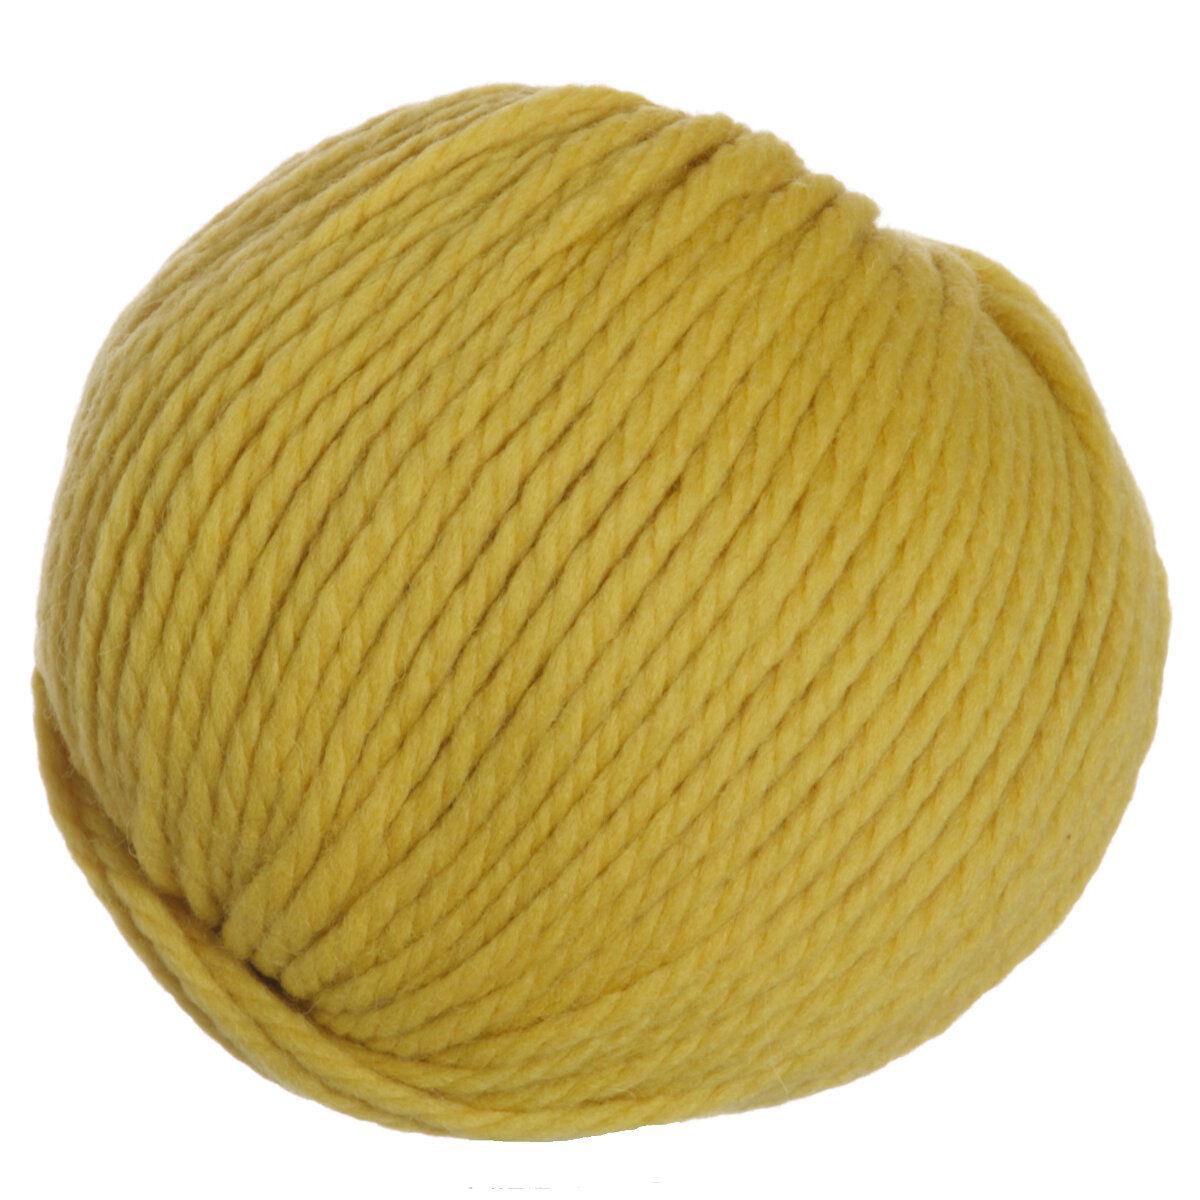 Knitting Patterns Big Wool : Rowan Big Wool Yarn - 68 - Sun (Discontinued) at Jimmy ...